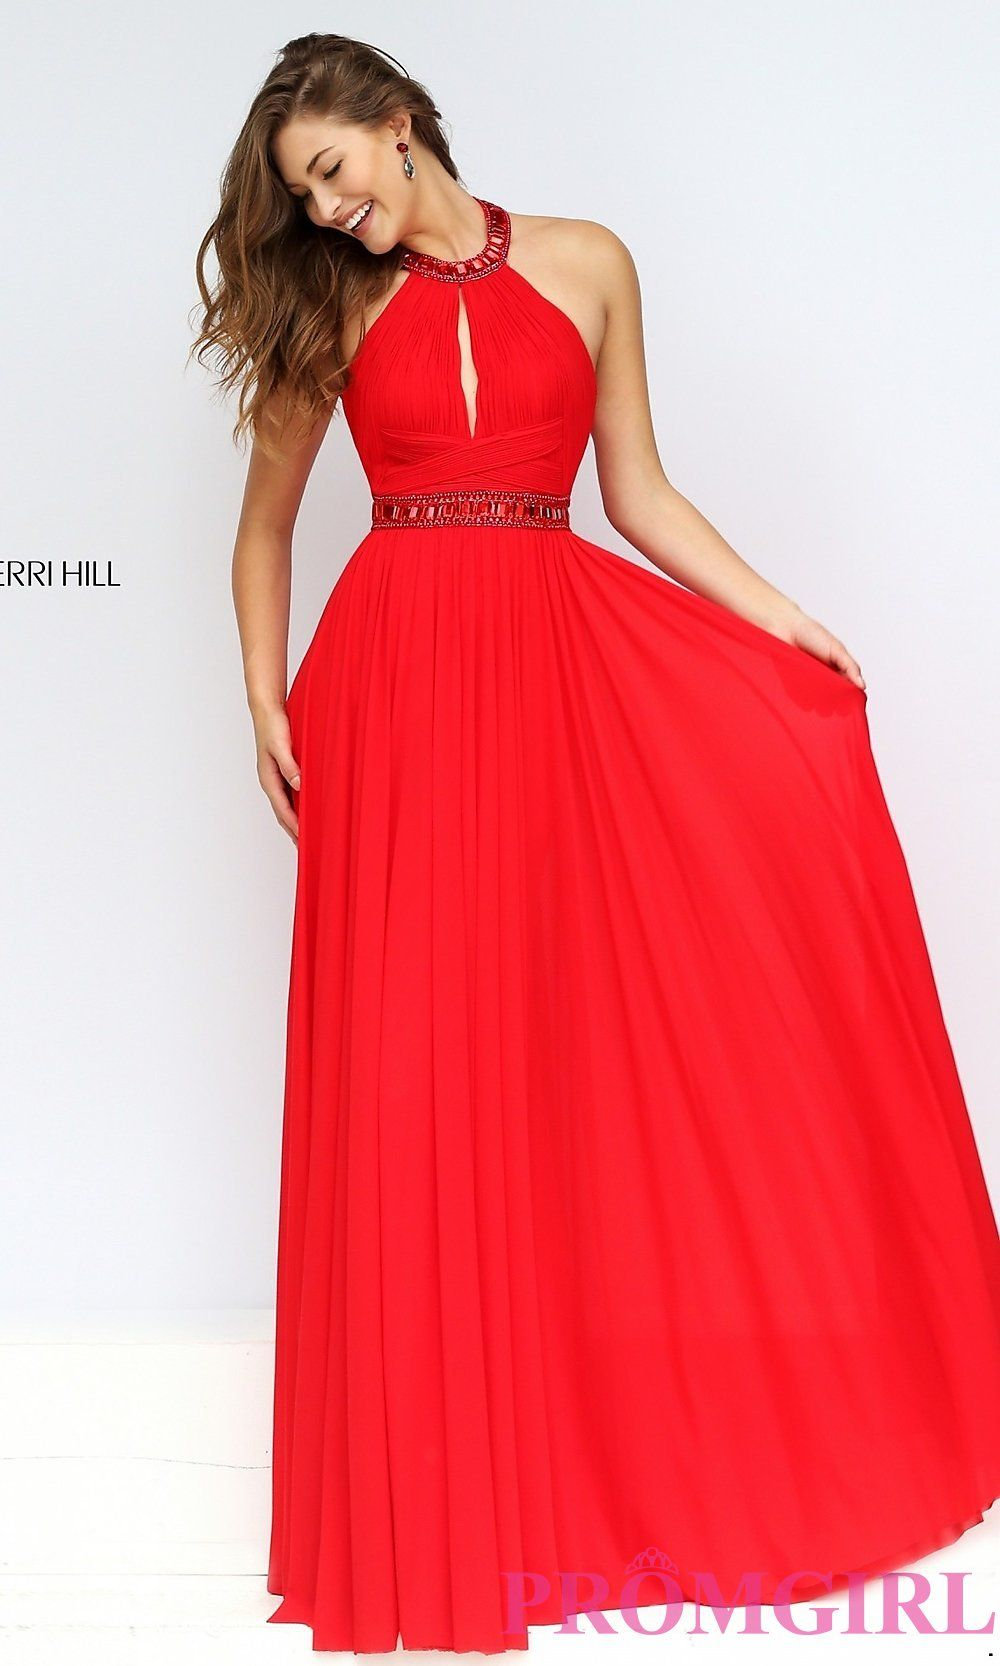 Image Of Floor Length High Neck Halter Dress Detail Image 1